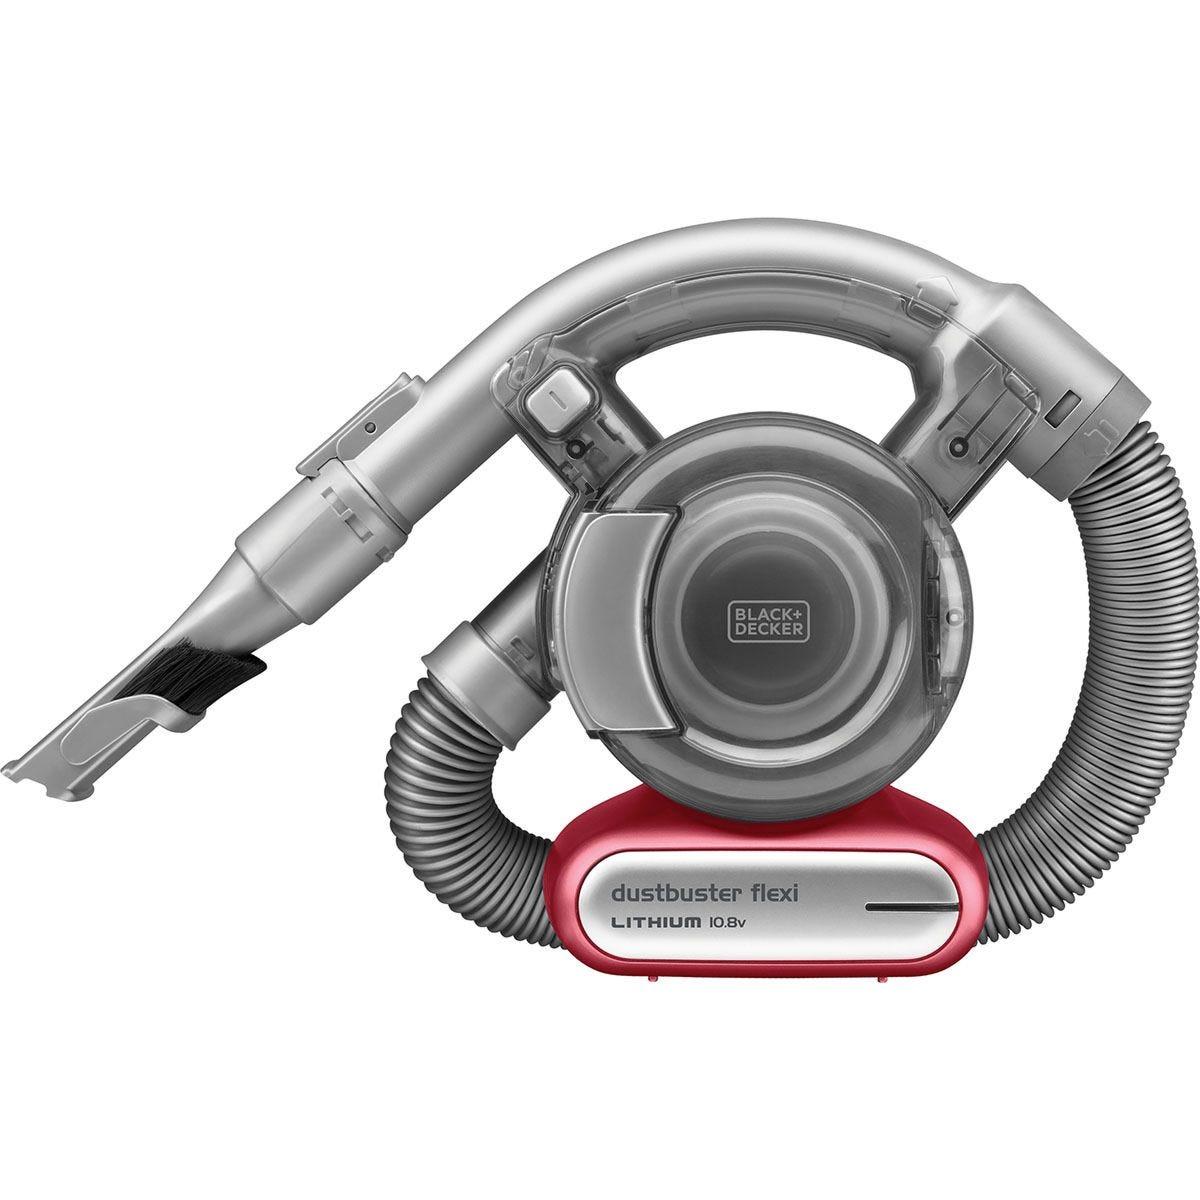 Black + Decker PD1020L-GB Flexi Dustbuster 10.8V Cordless Handheld Vacuum Cleaner - Grey/Red